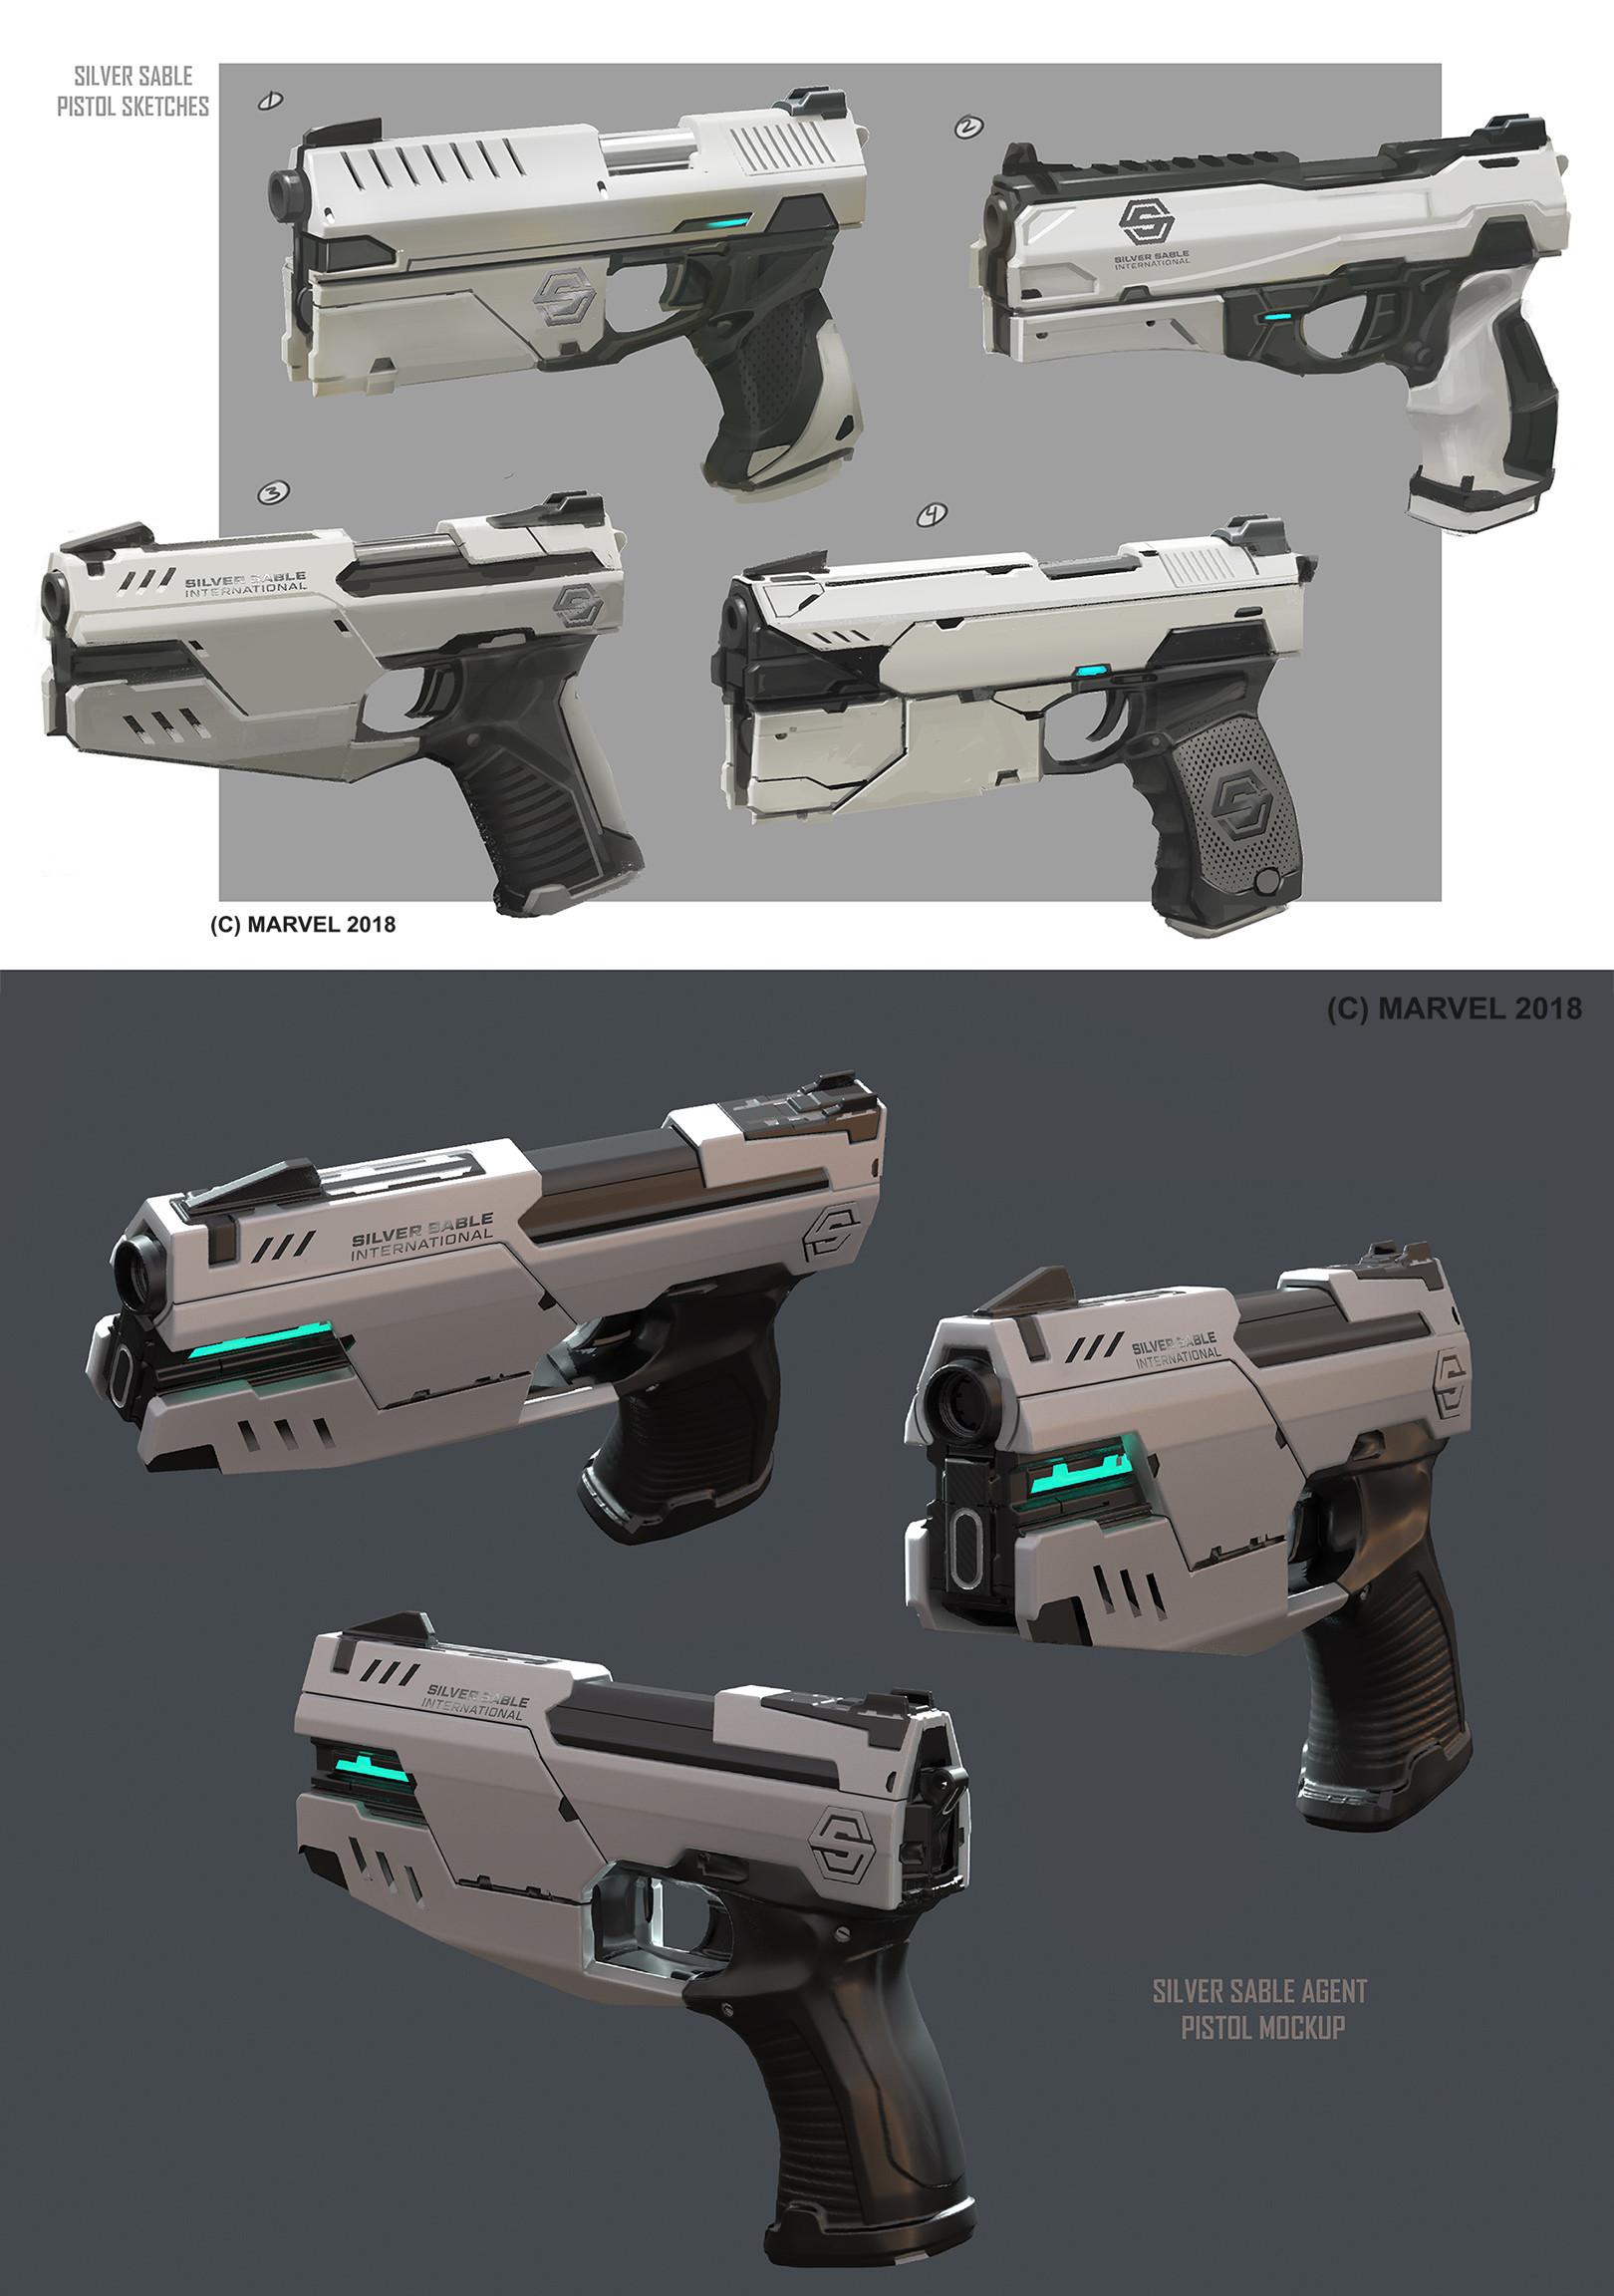 Daryl mandryk sable agent pistol